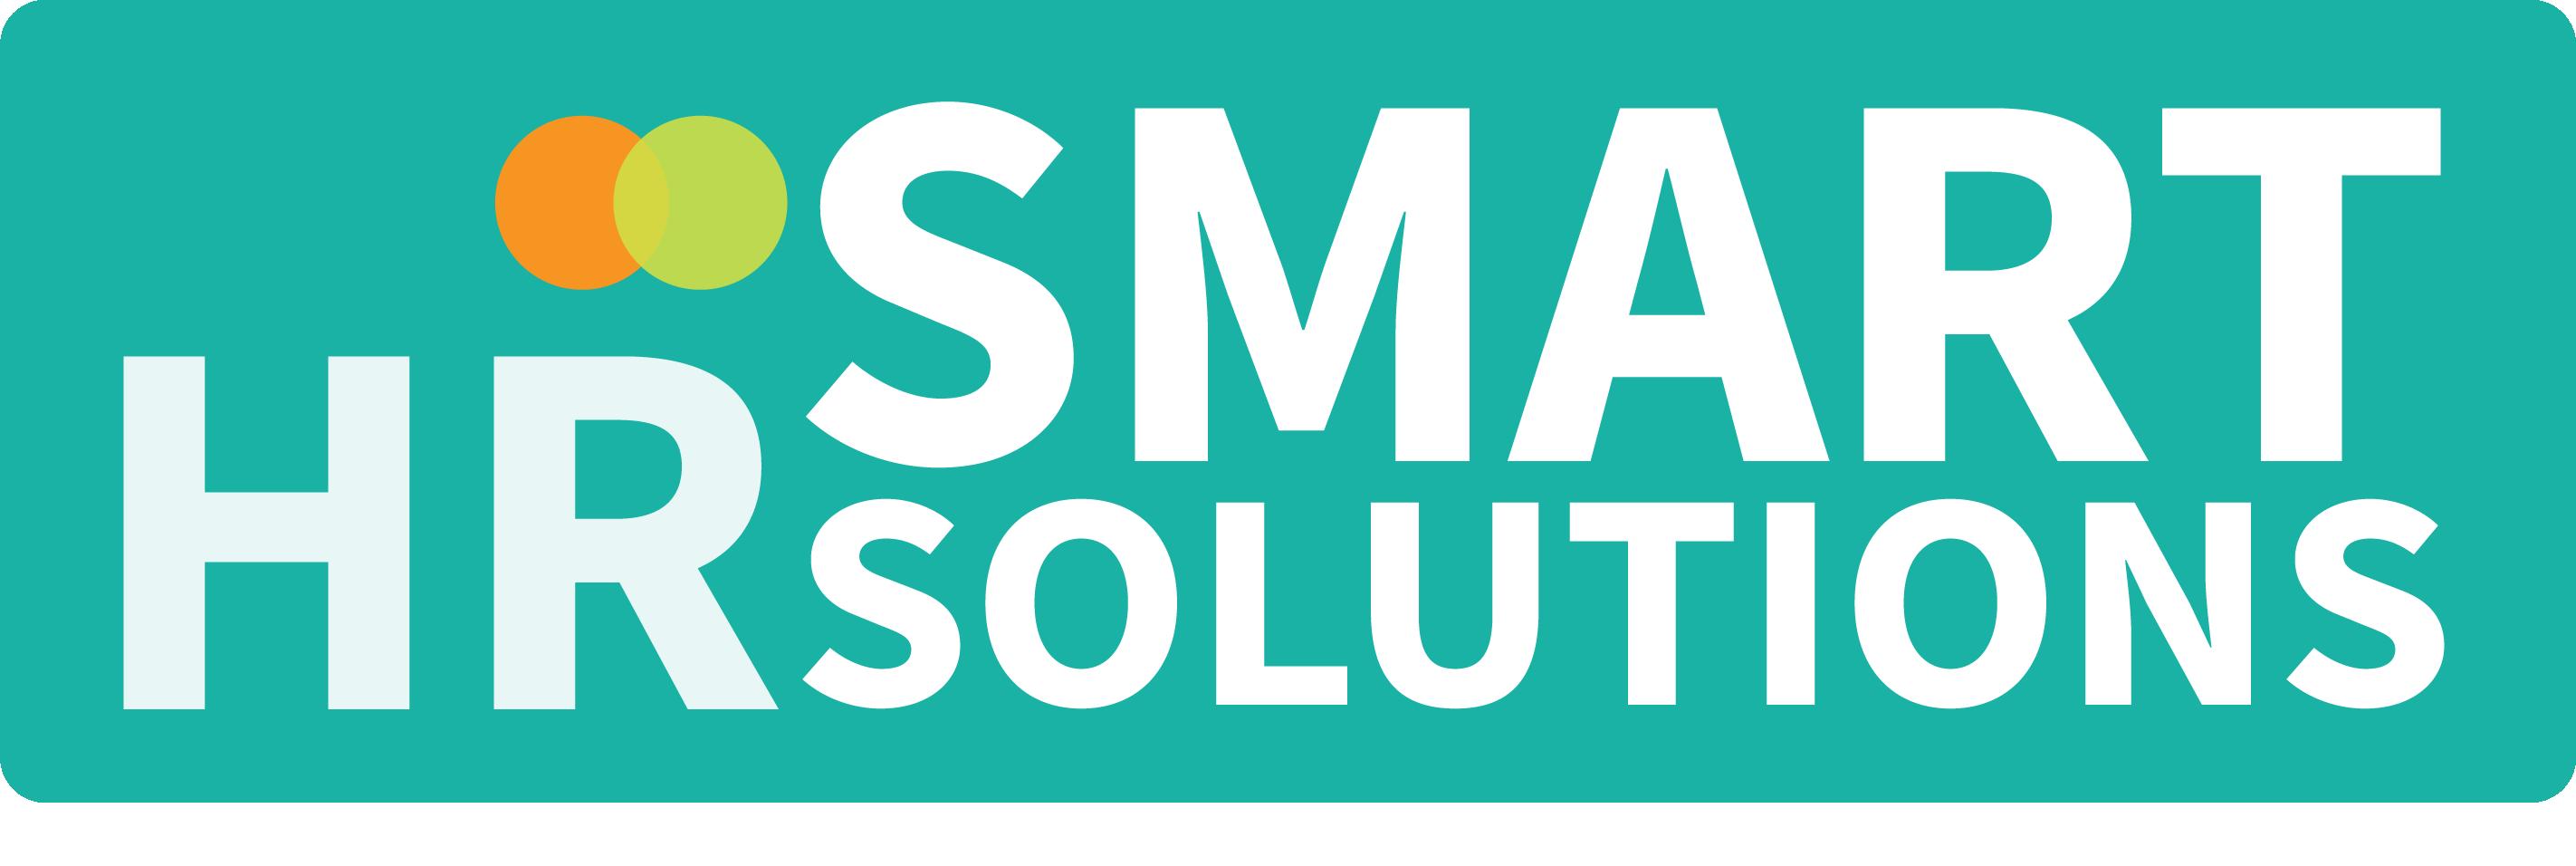 Smart HR Solutions Announcement | Newland Associates | Executive Search | Outplacement | Predictive Index Partner | HR Services